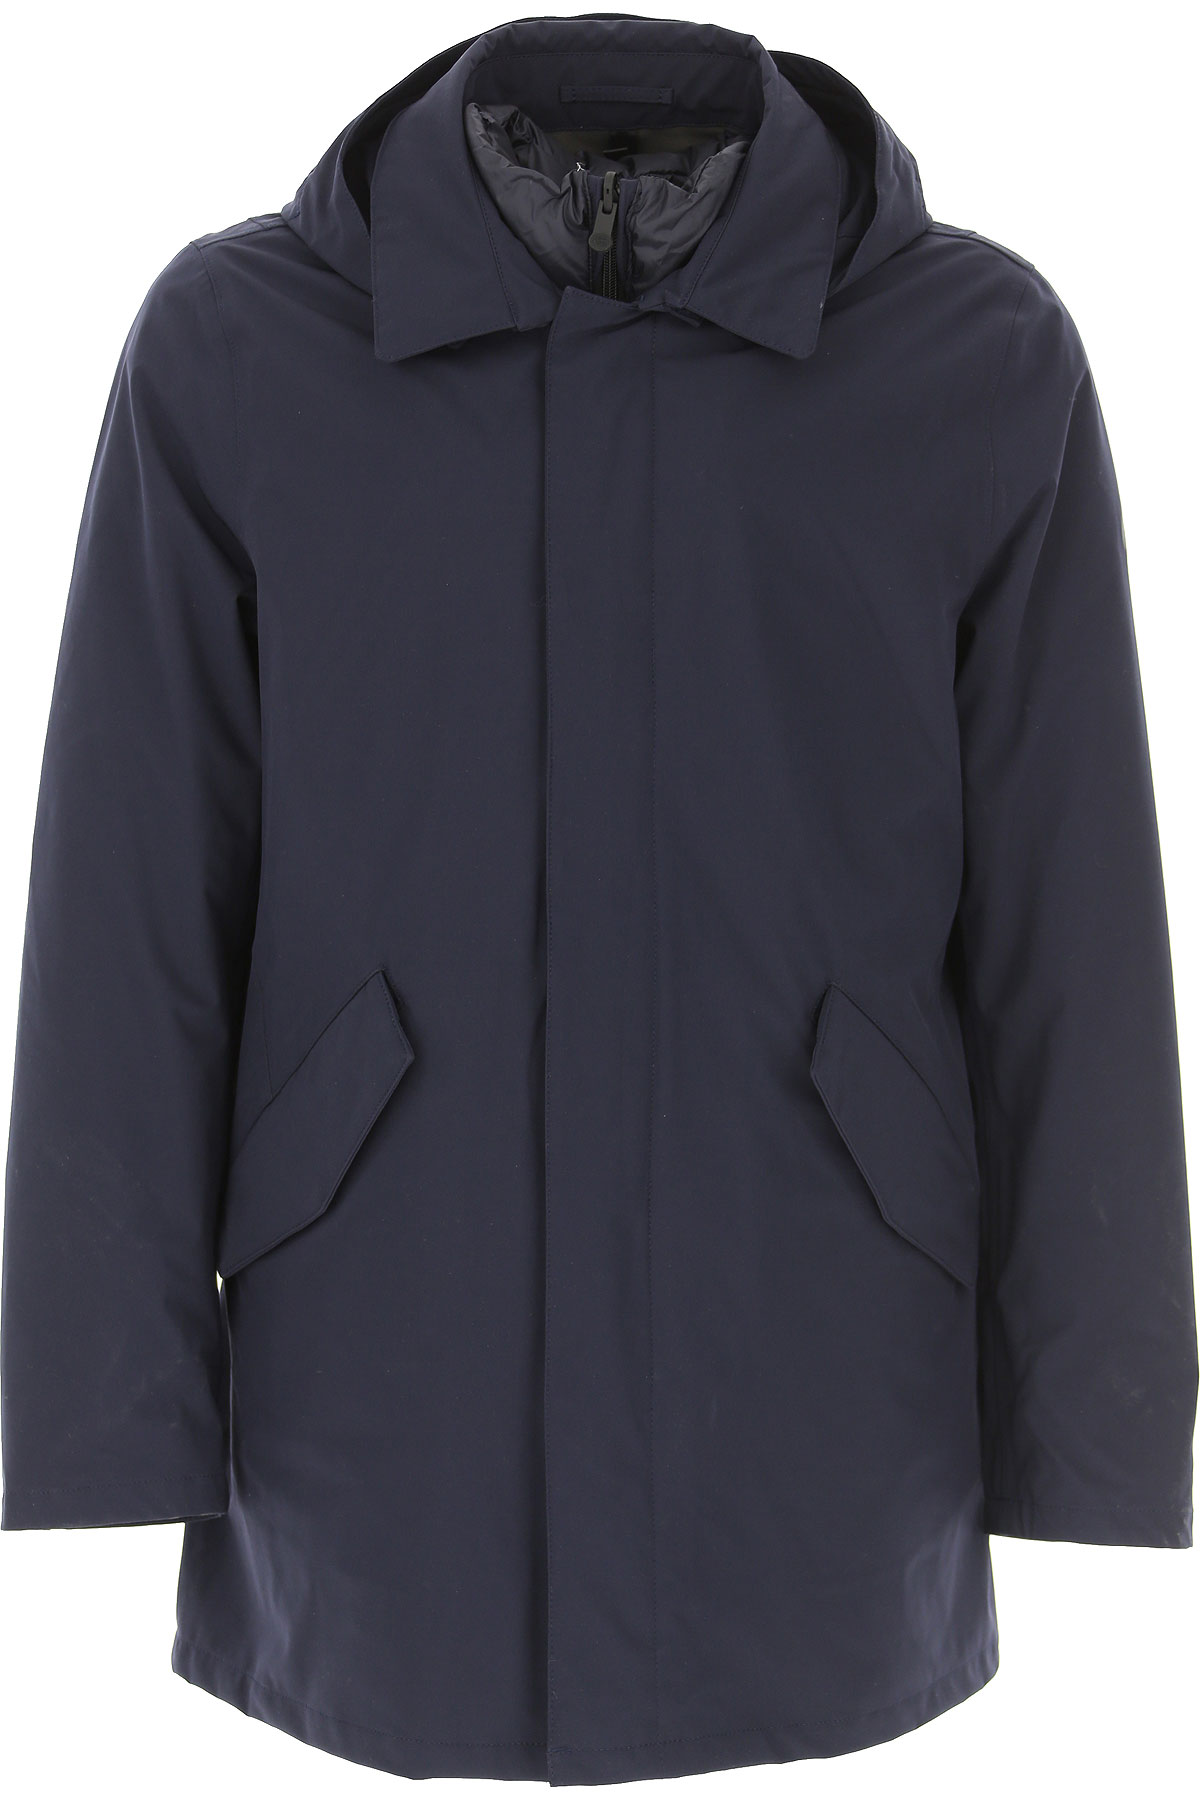 People of Shibuya Down Jacket for Men, Puffer Ski Jacket On Sale, Ink Blue, polyamide, 2019, L M XL